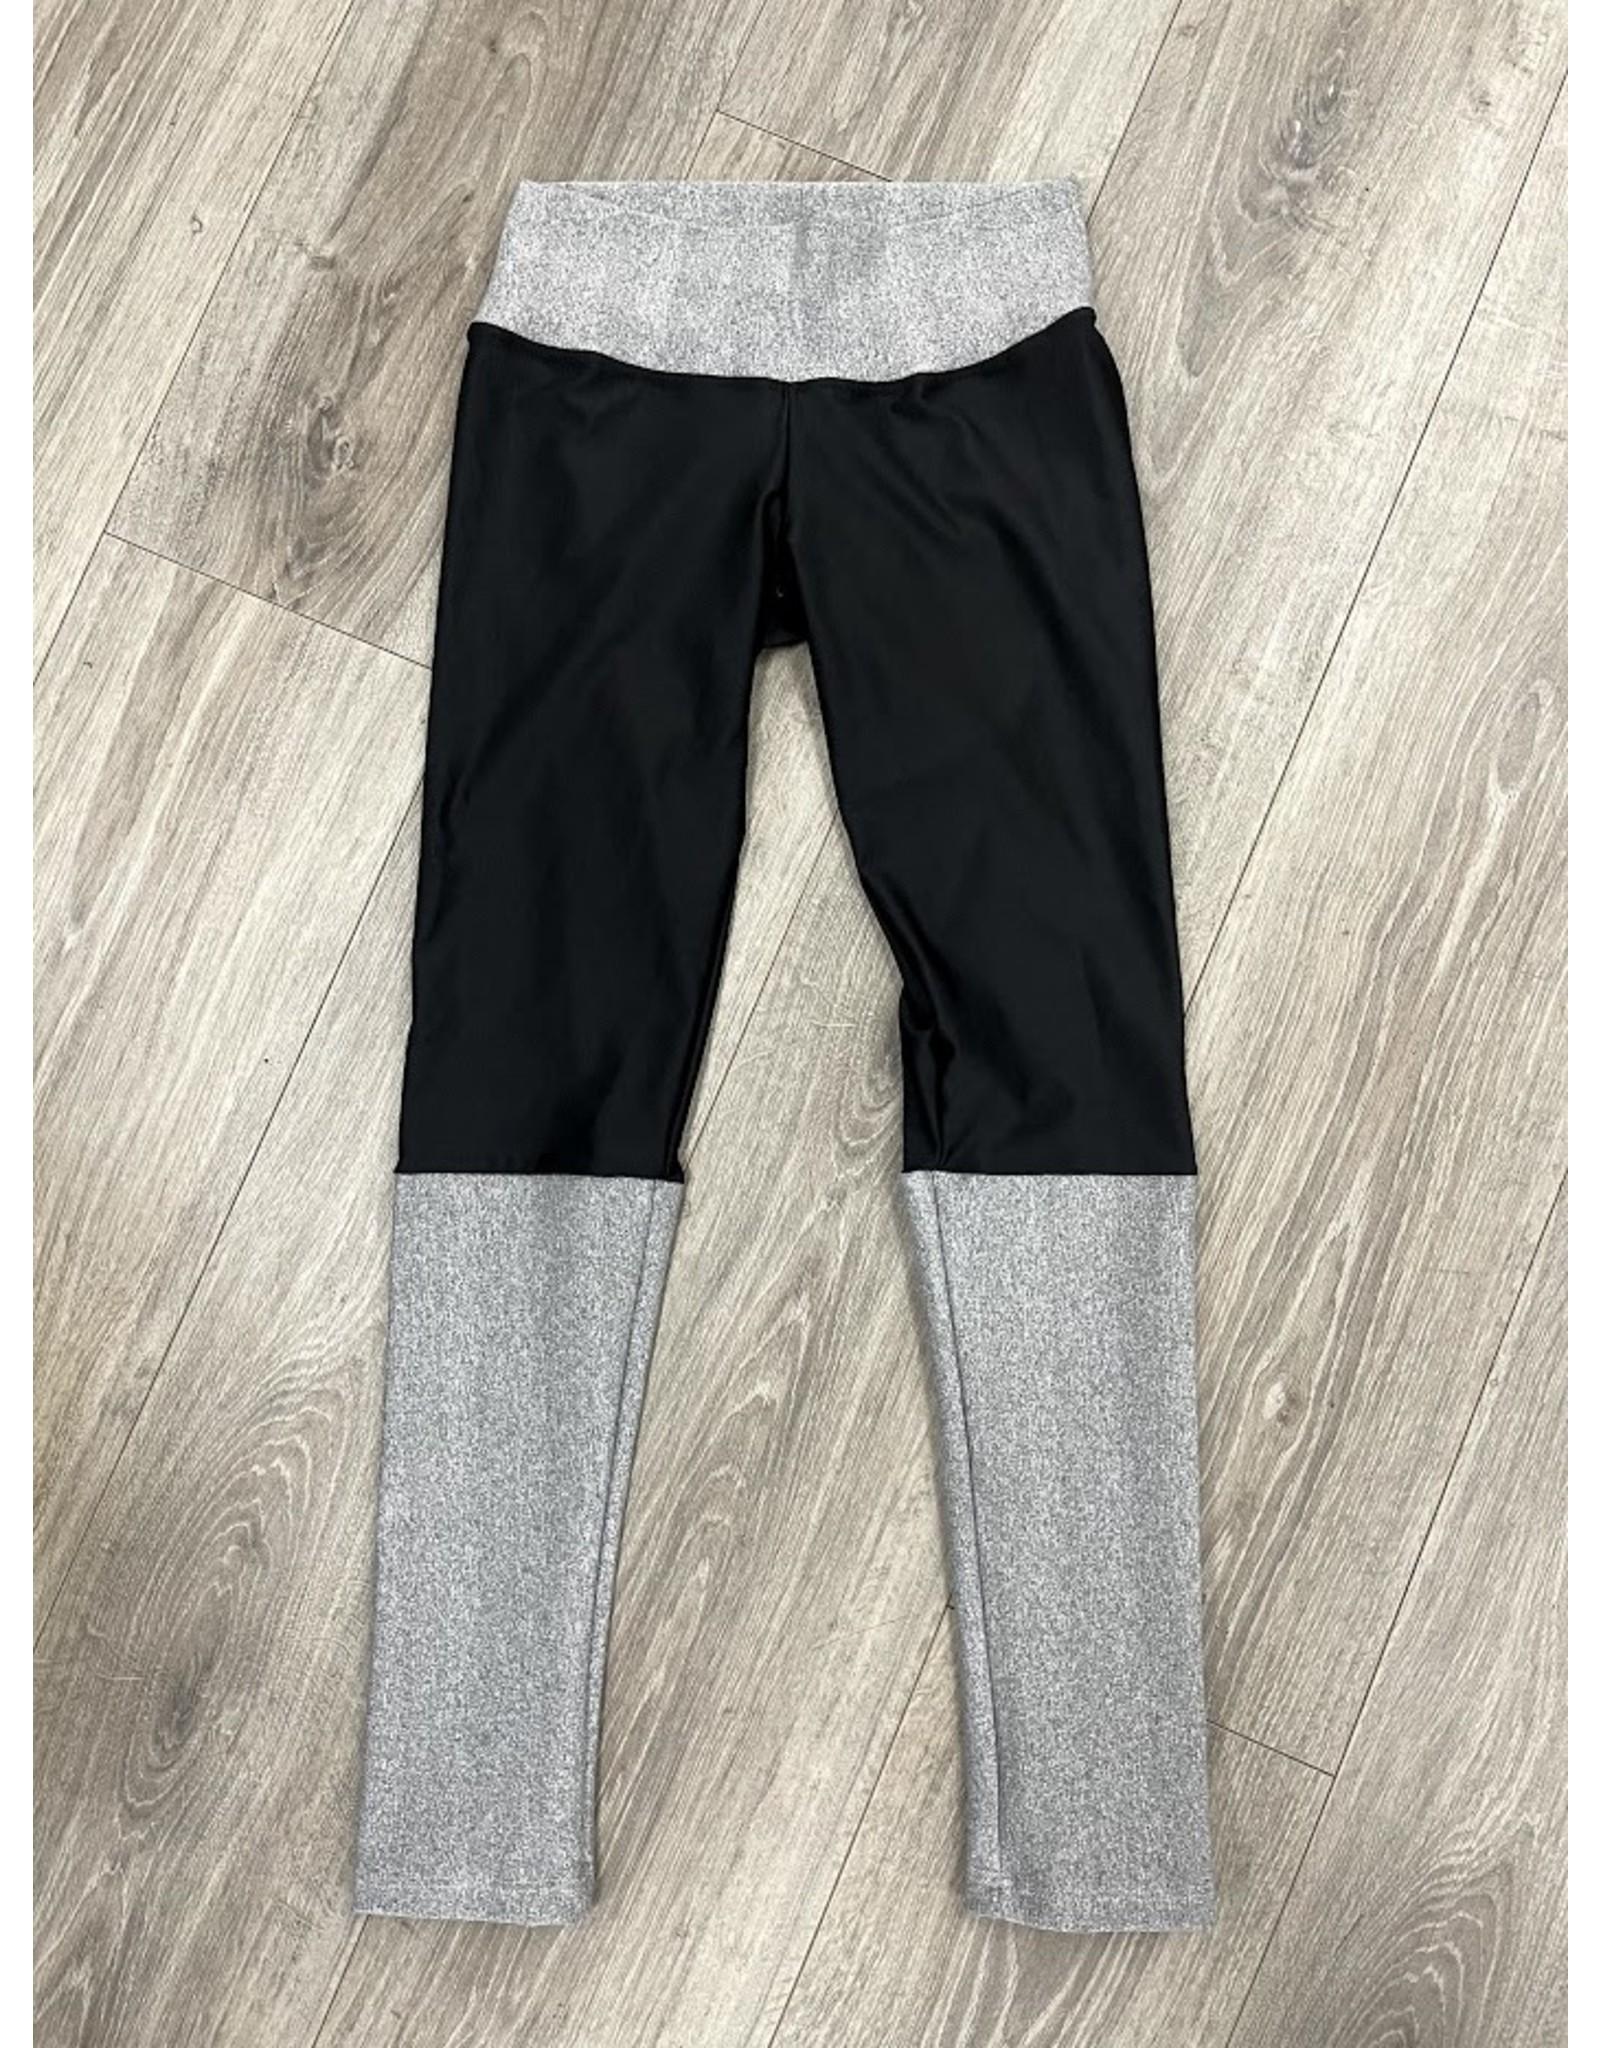 Alejandra Lujan Black/Grey Leggings